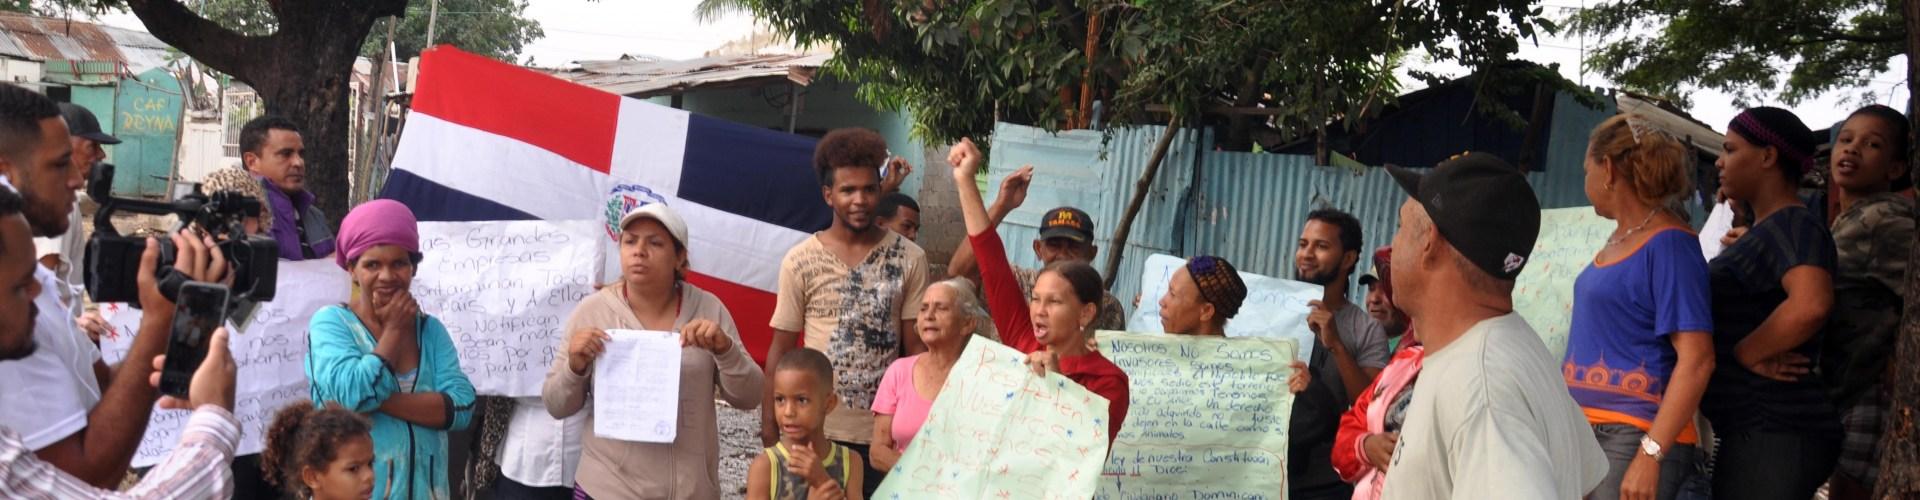 Protestan contra posible desalojo